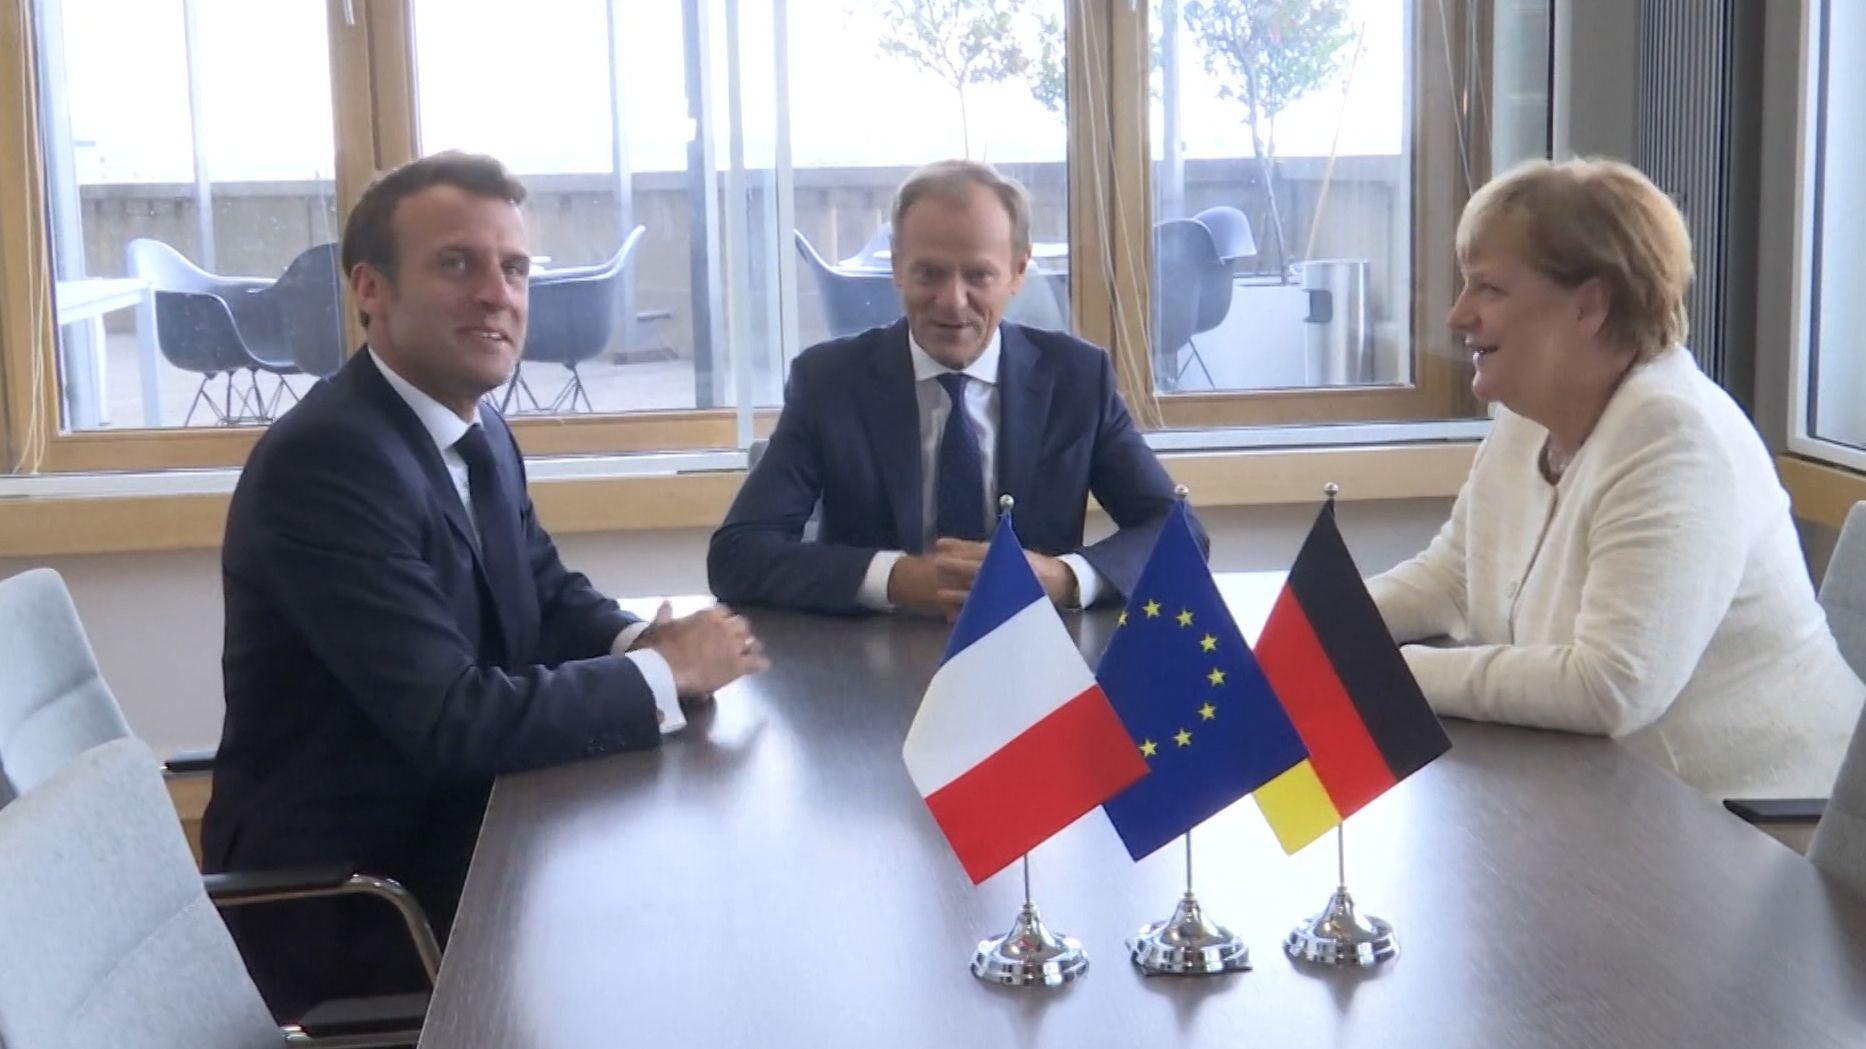 Emanuel Macron, Donald Tusk und Angela Merkel beim EU-Gipfel